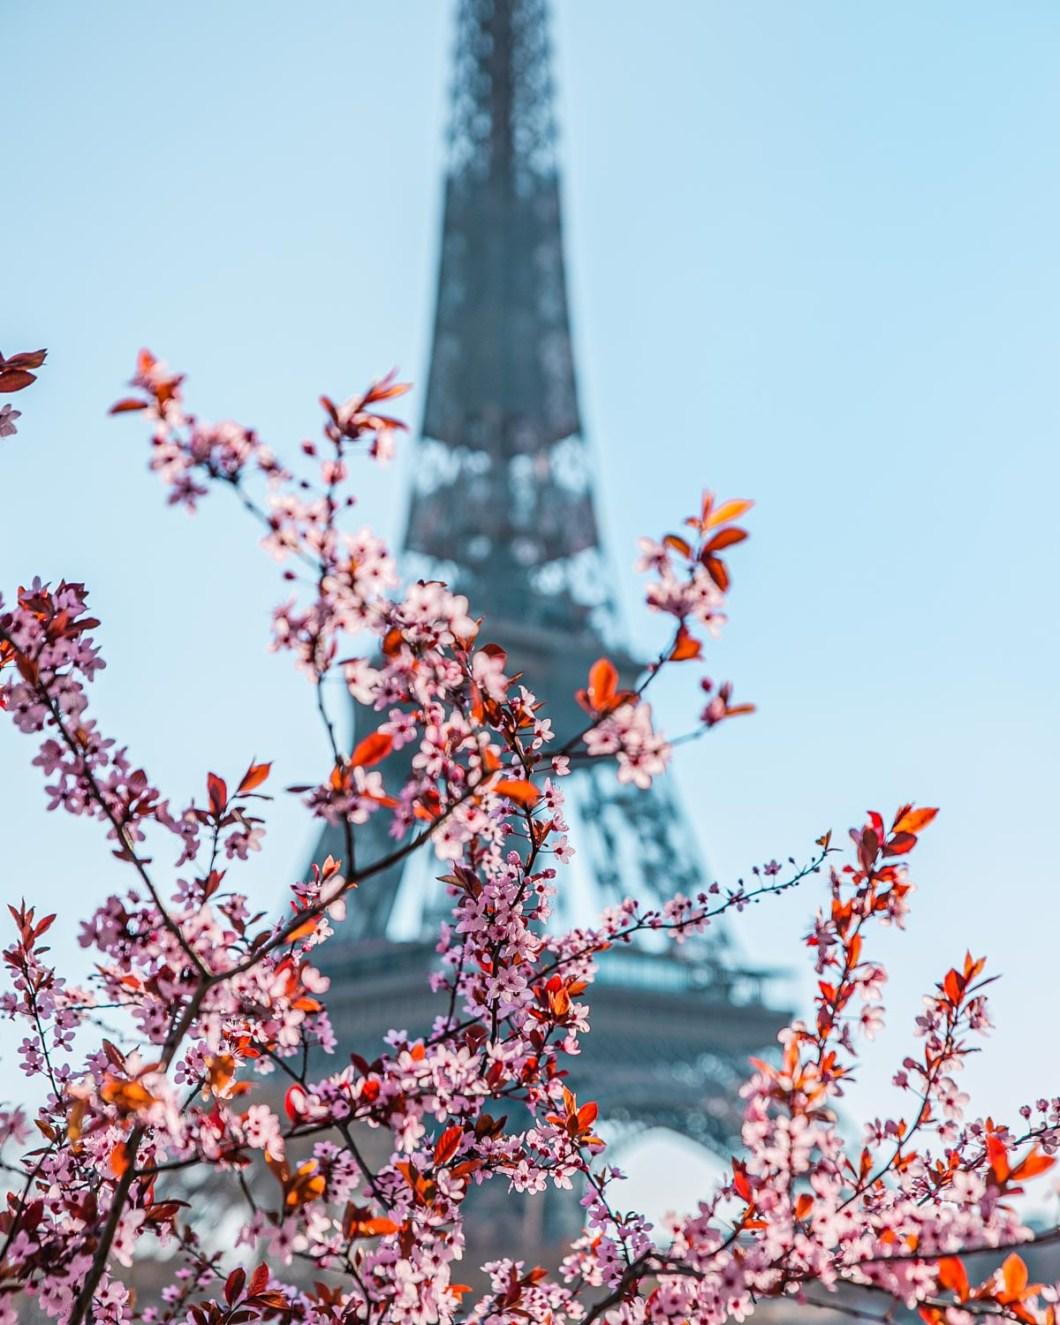 Plum blossoms at the Eiffel Tower in avenue de New York - Paris